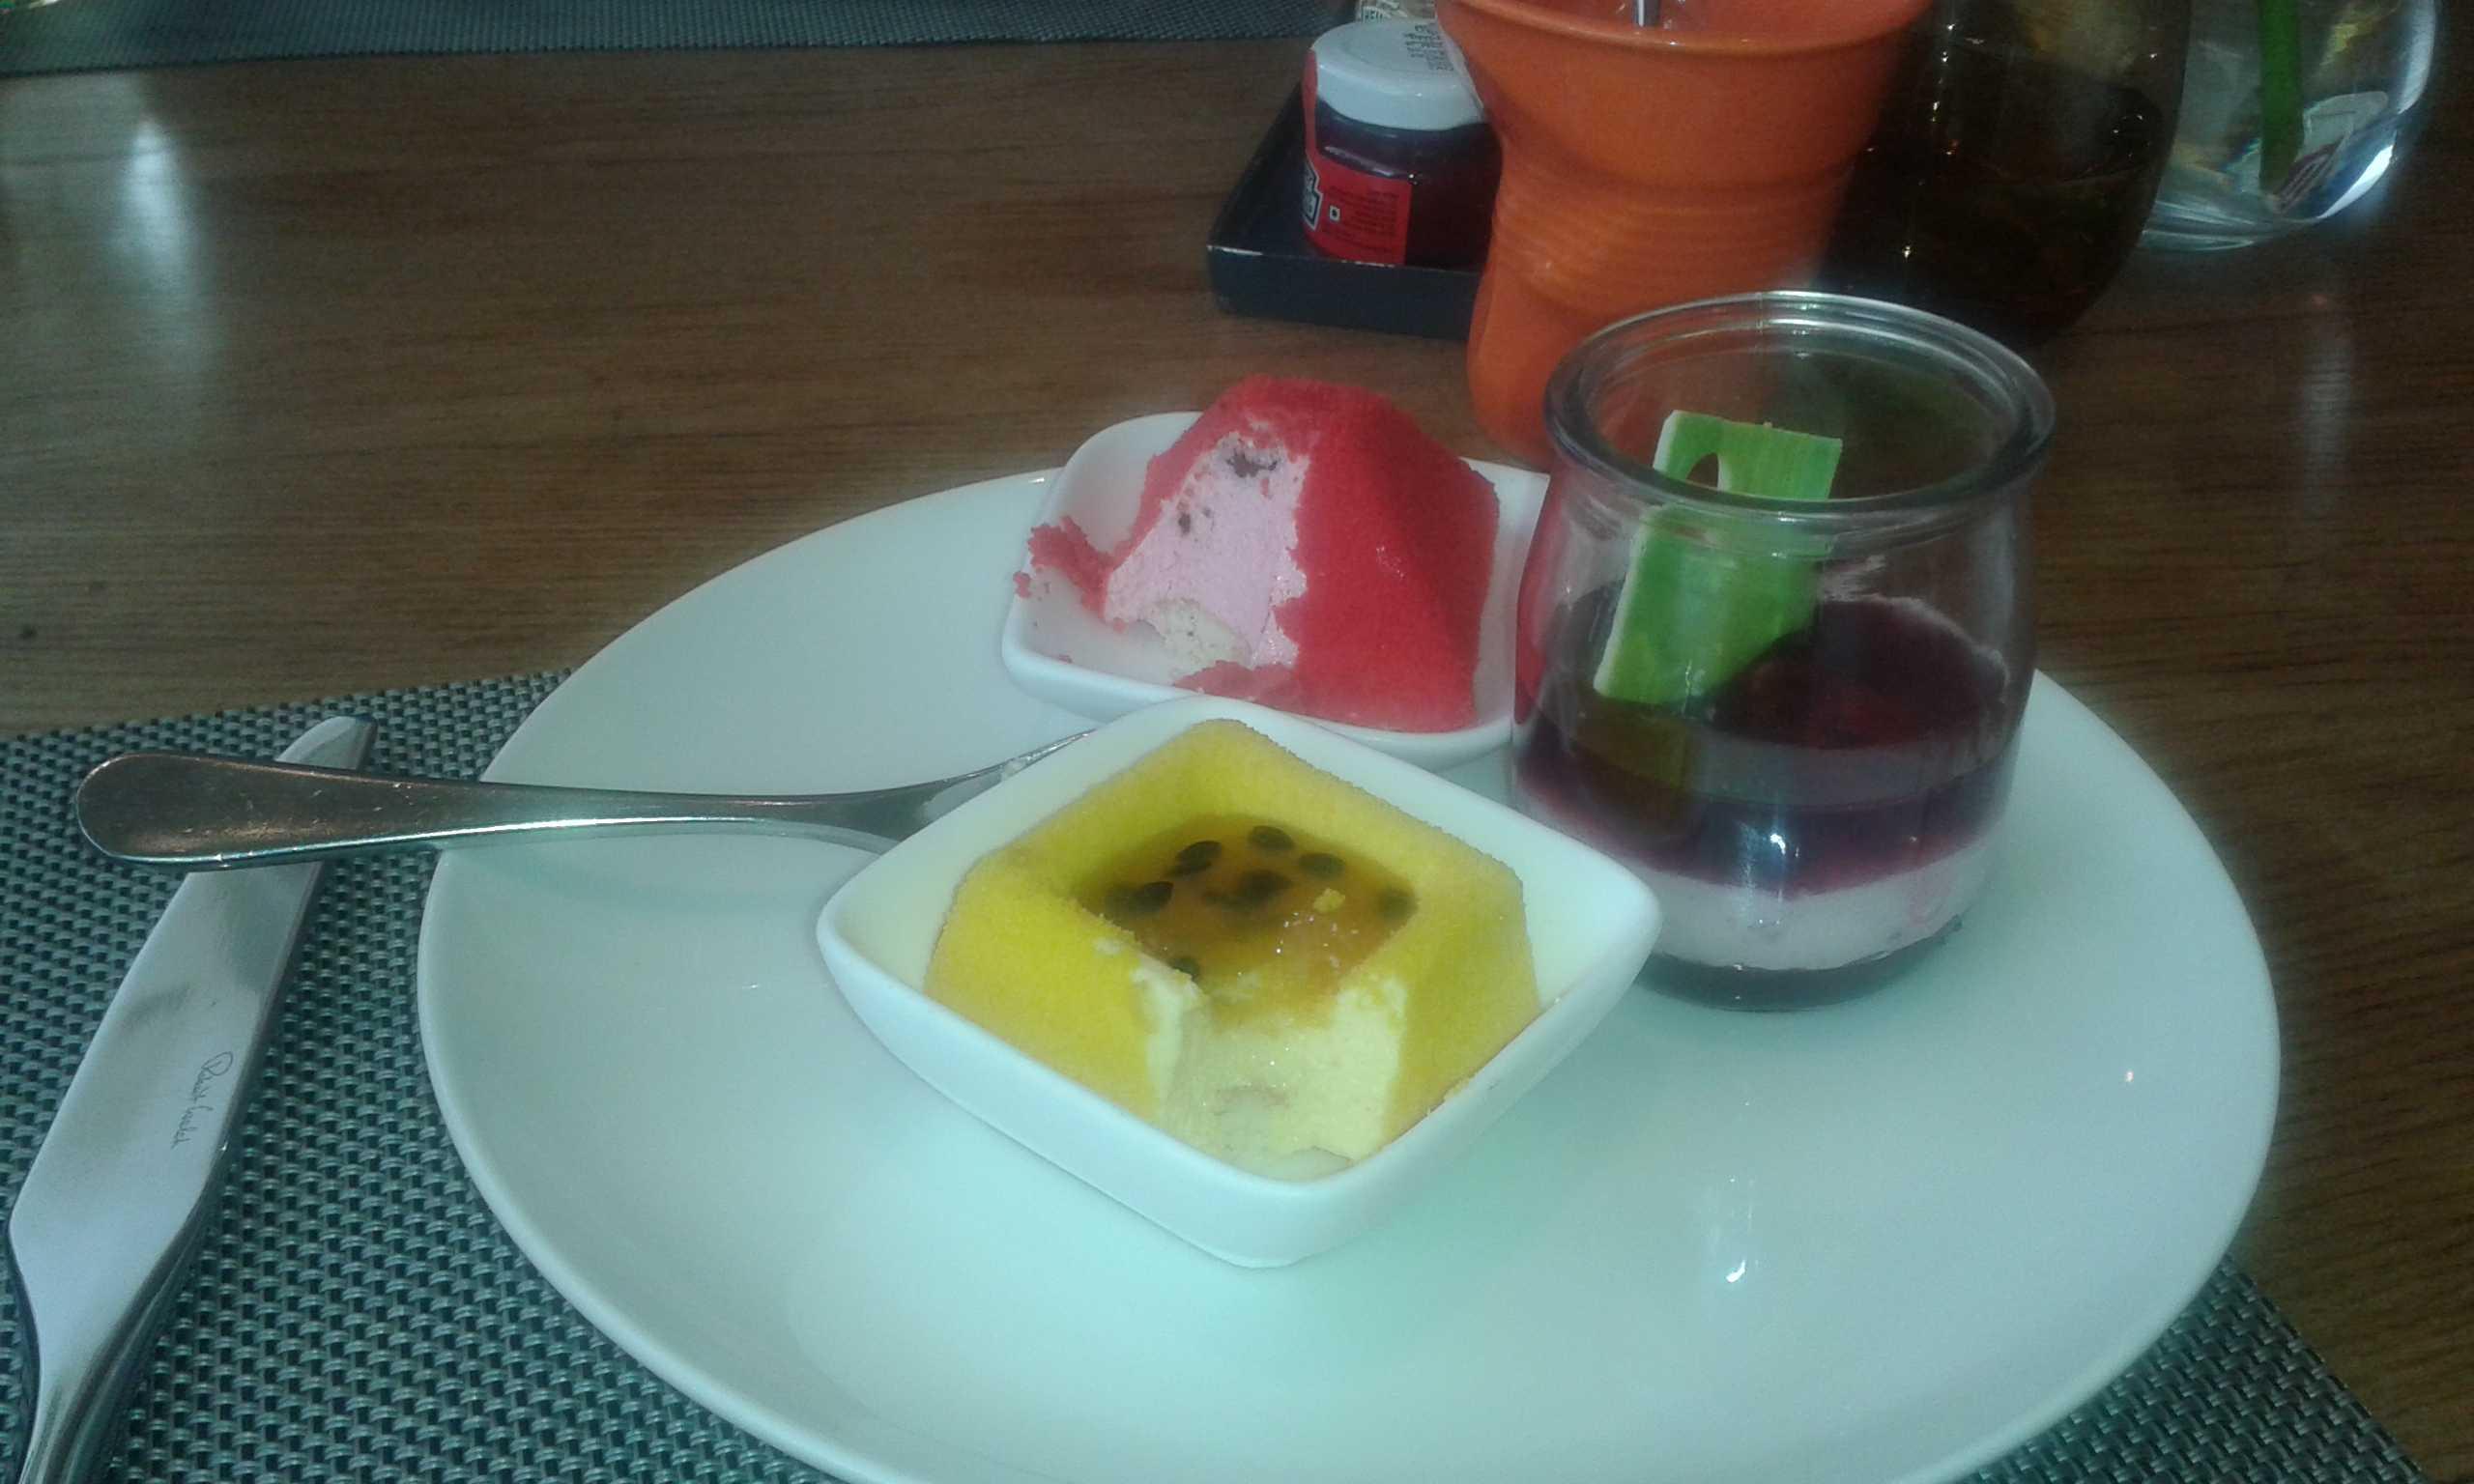 Tamra desserts-fnbworld-ravi v chhabra